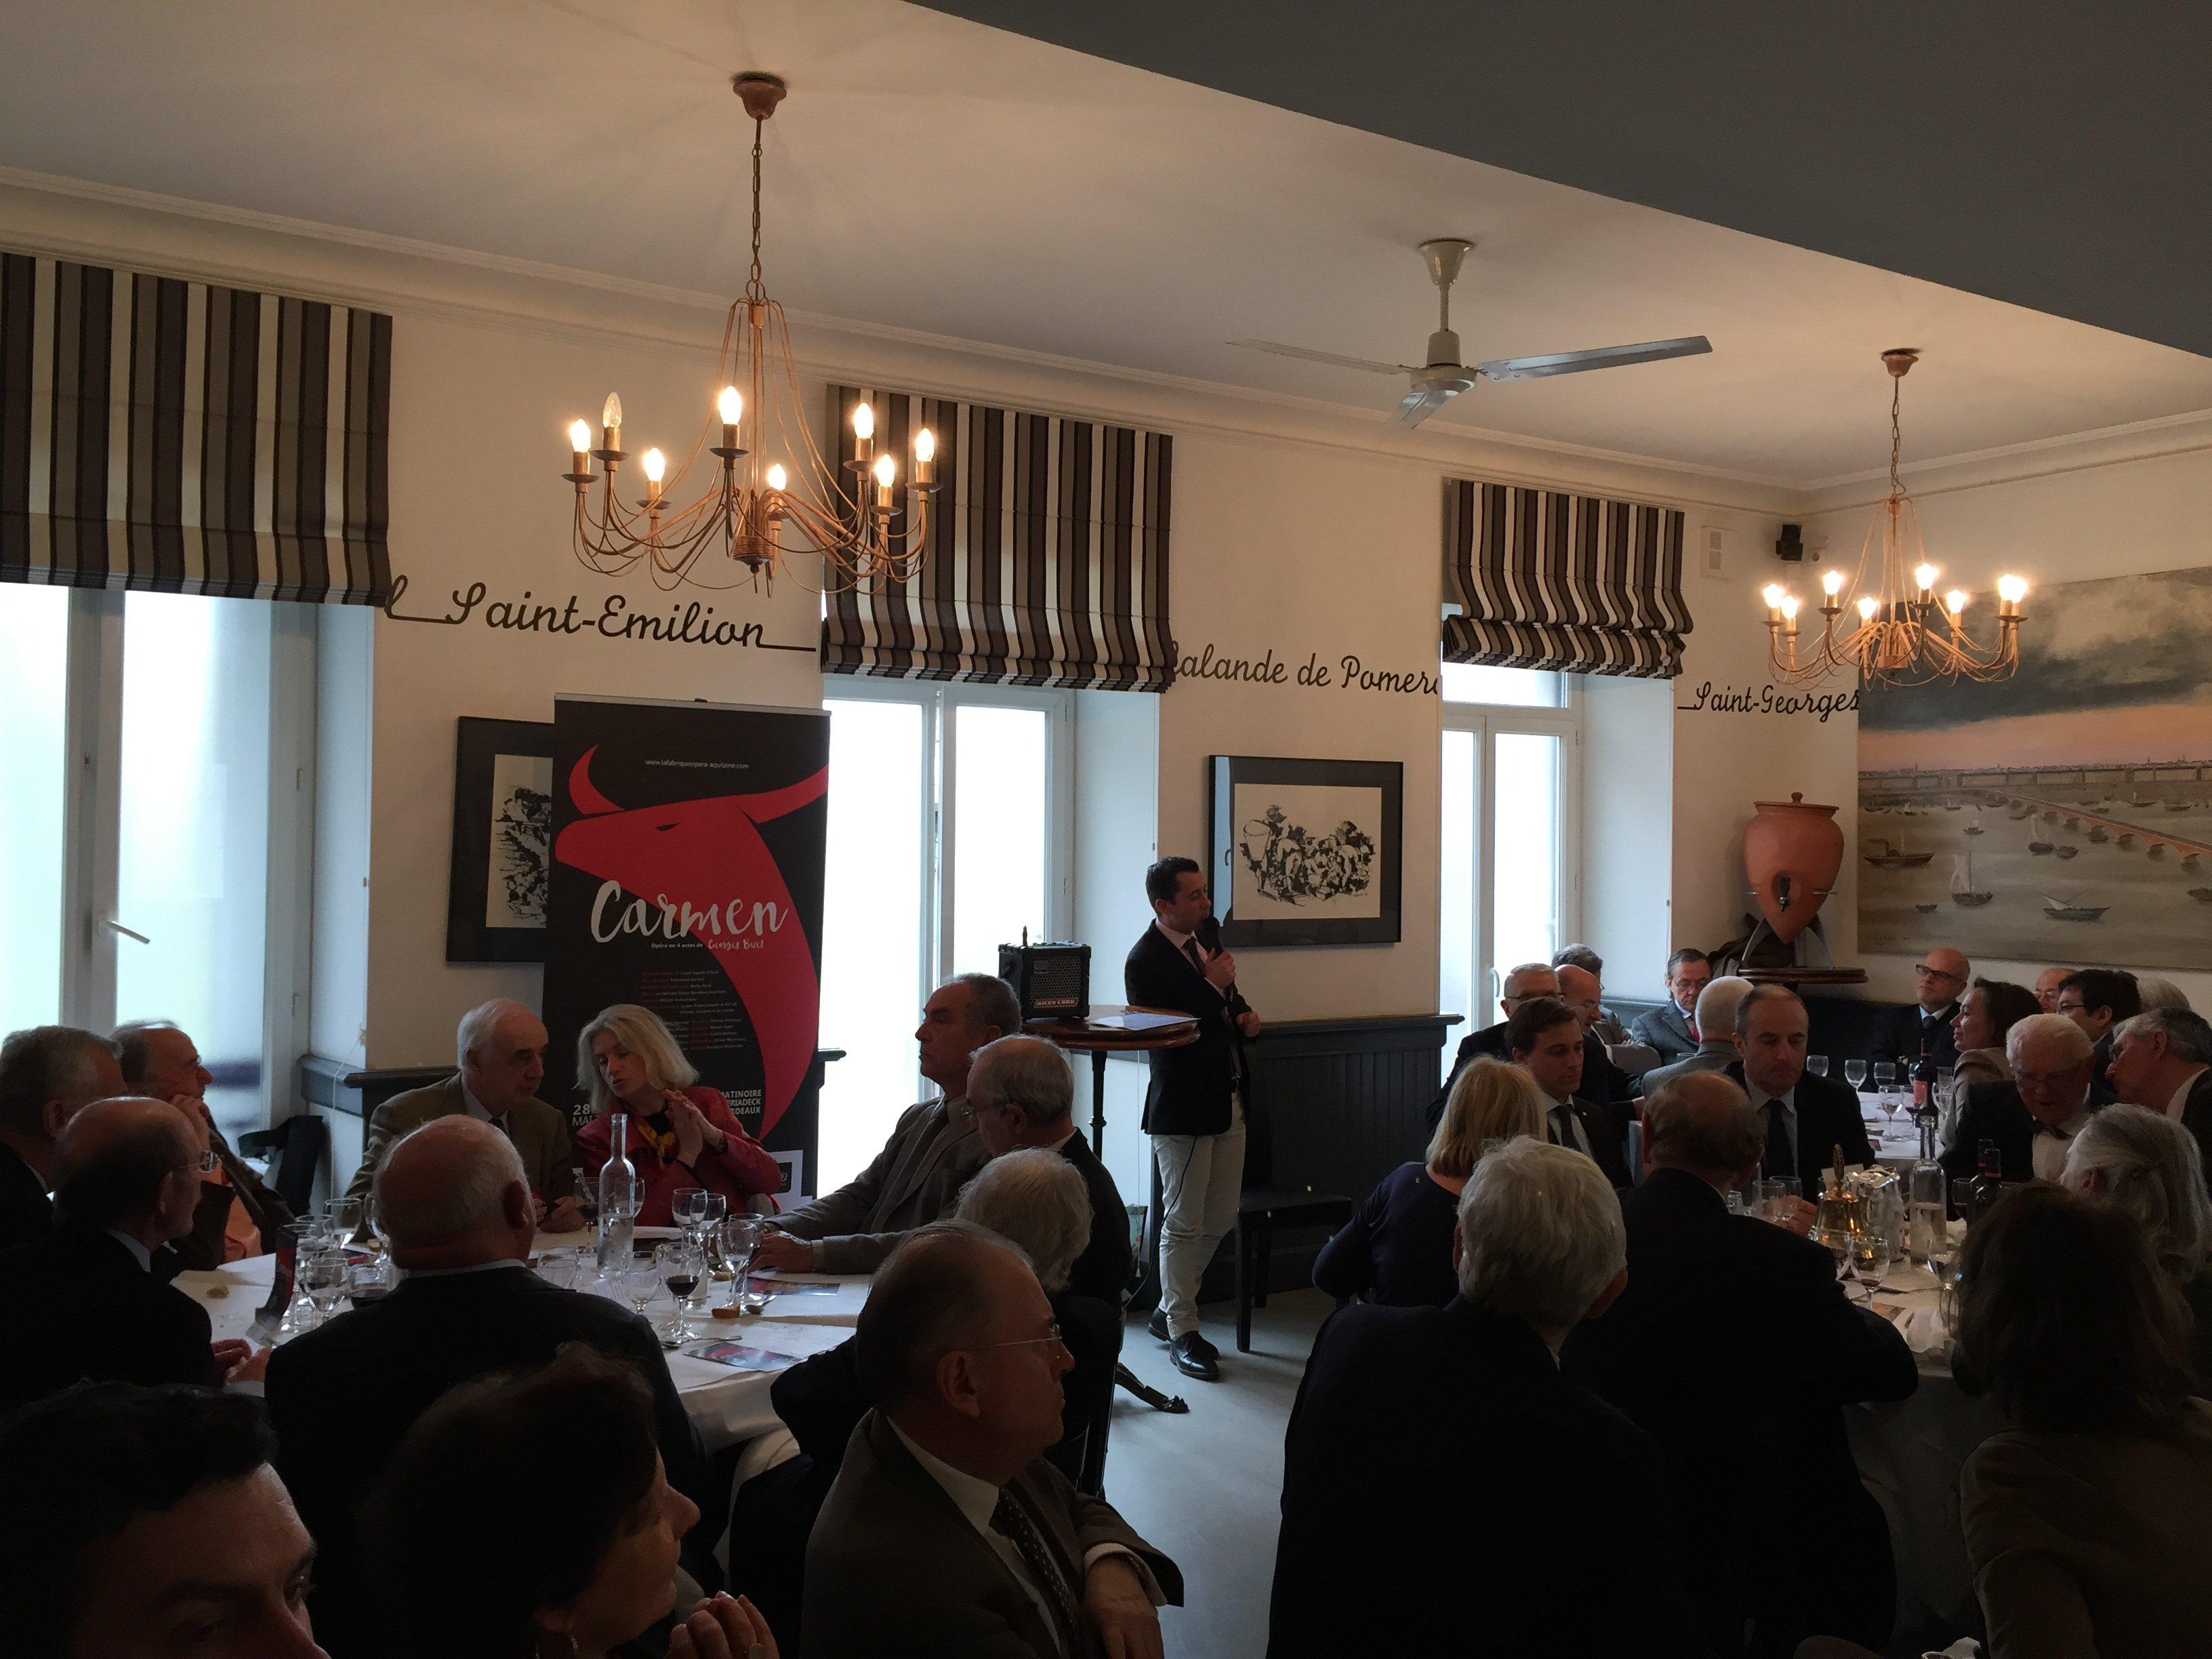 Photo déjeuner Rotary Club Bordeaux présentation Carmen Lionel Gaudin Villard mars 2017